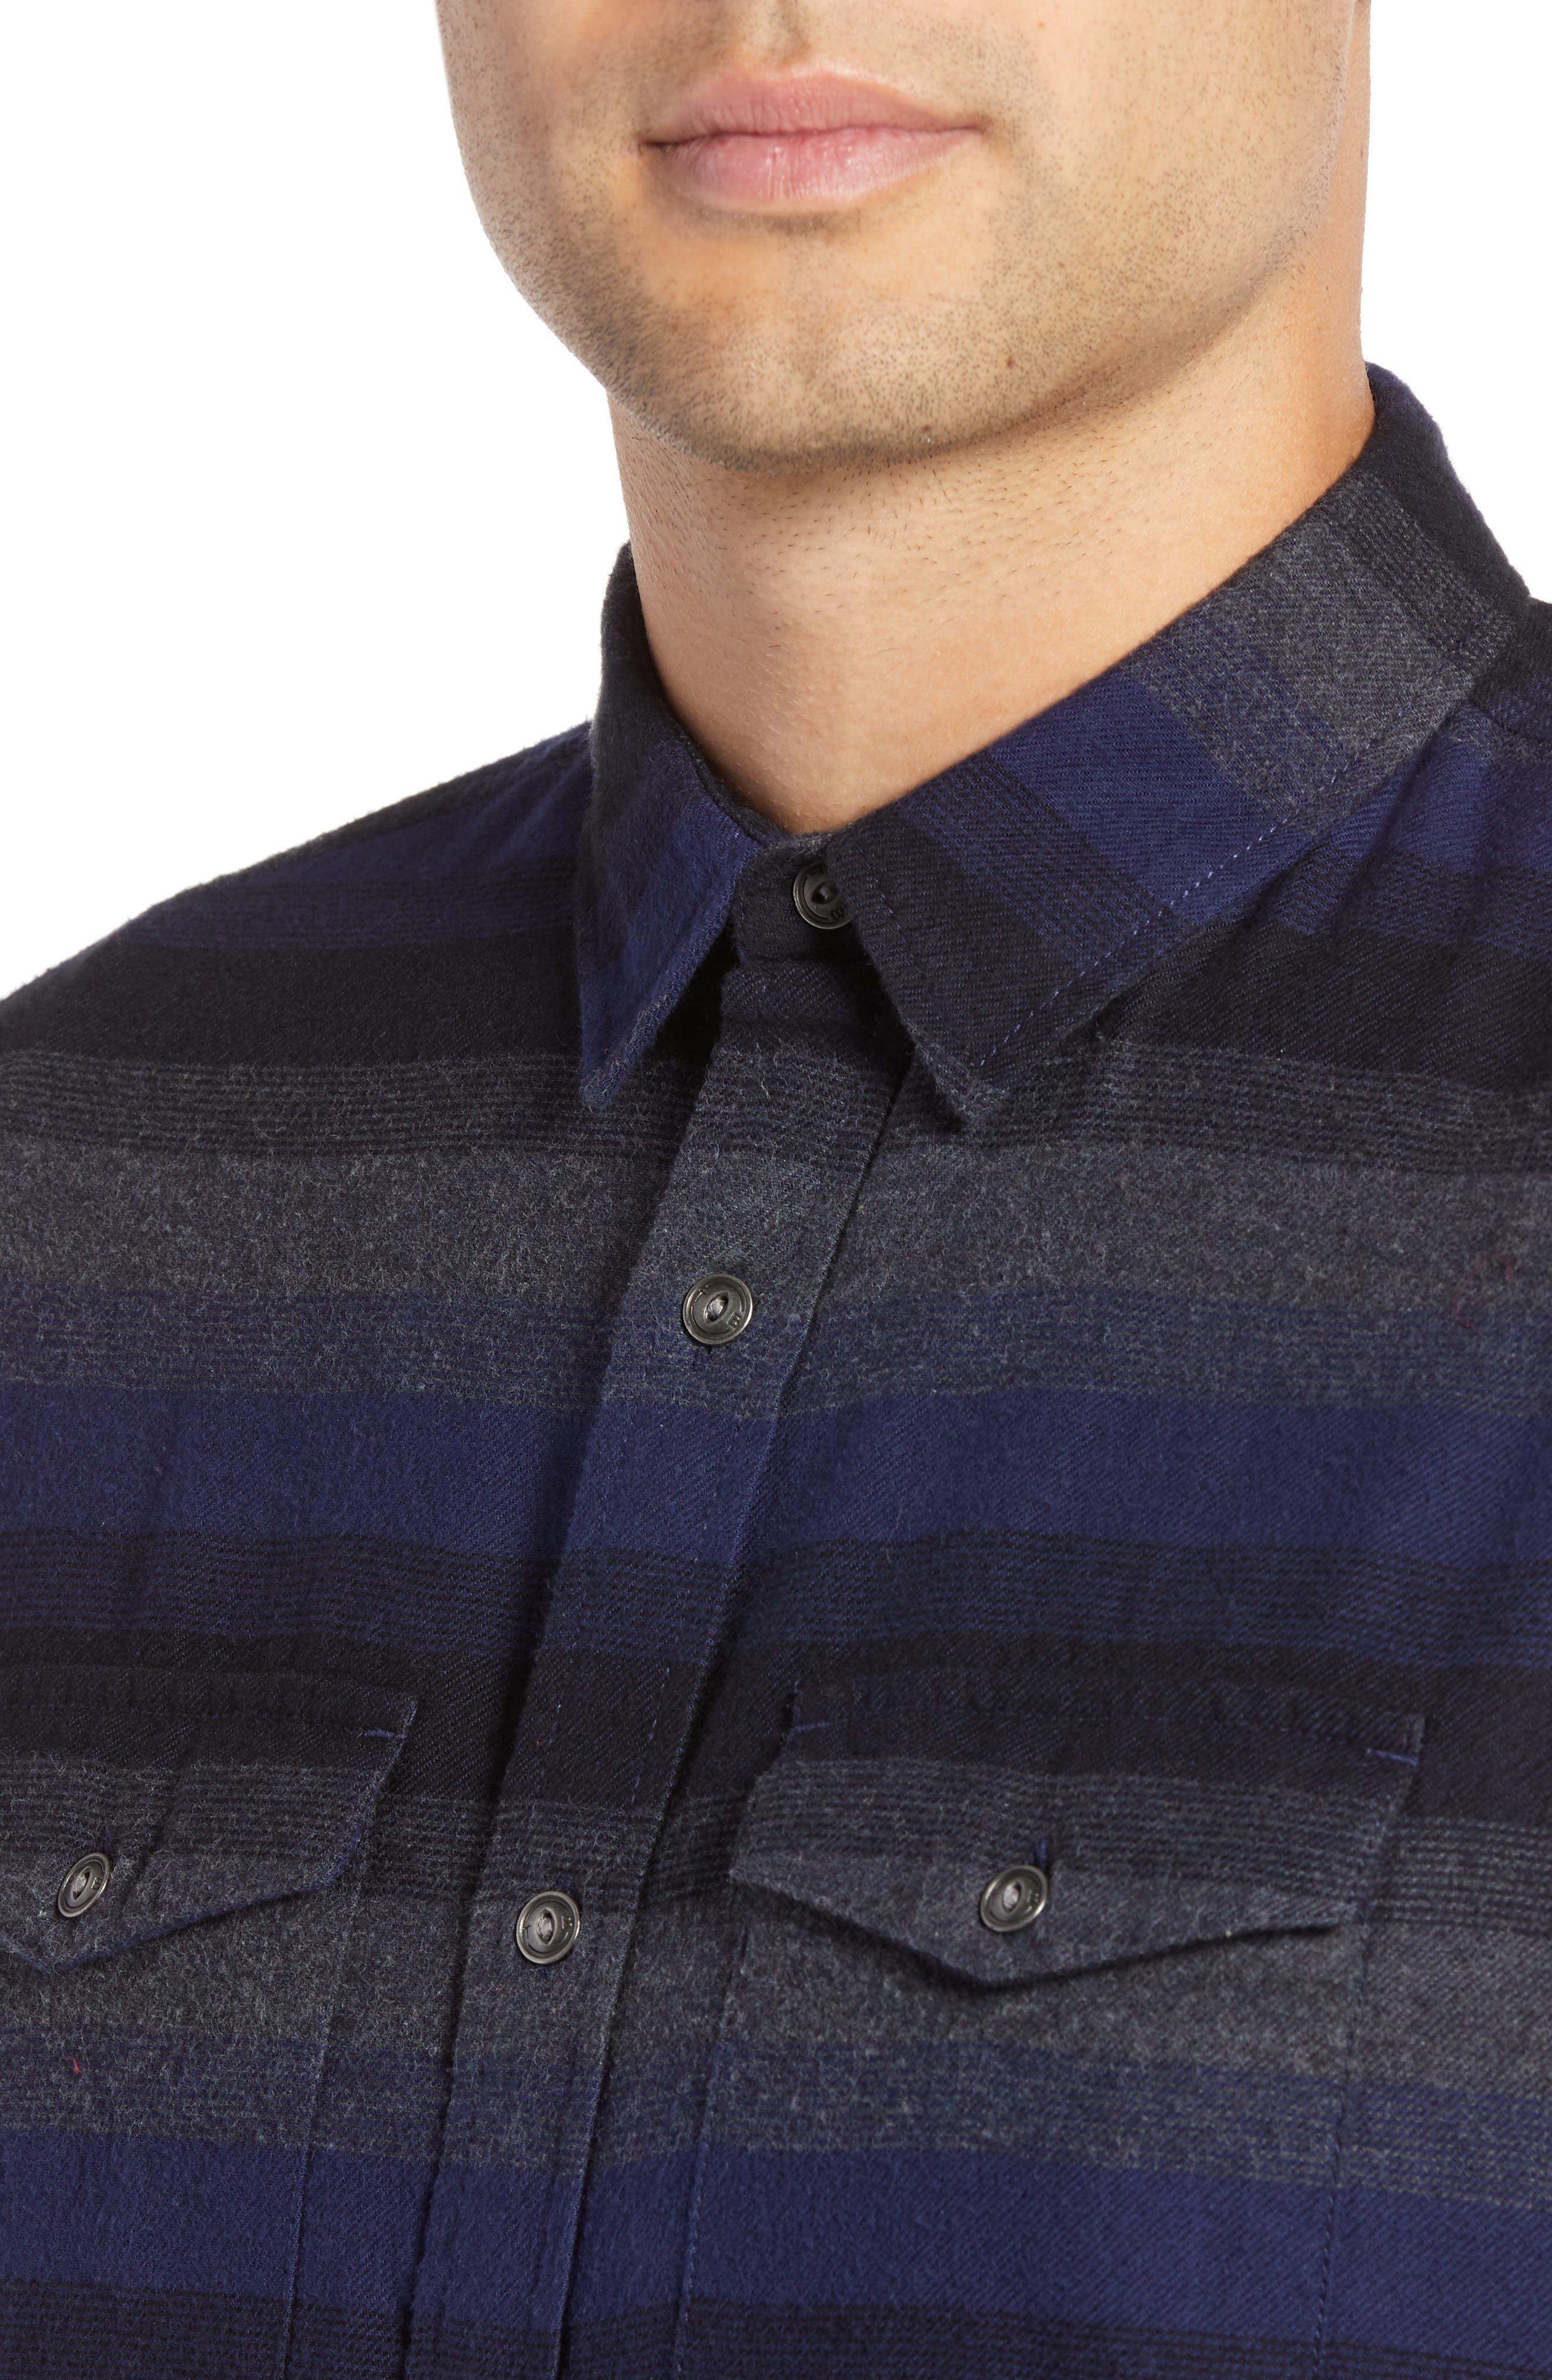 Regular Fit Ombré Sport Shirt,                             Alternate thumbnail 2, color,                             NAVY CHARCOAL OMBRE STRIPE